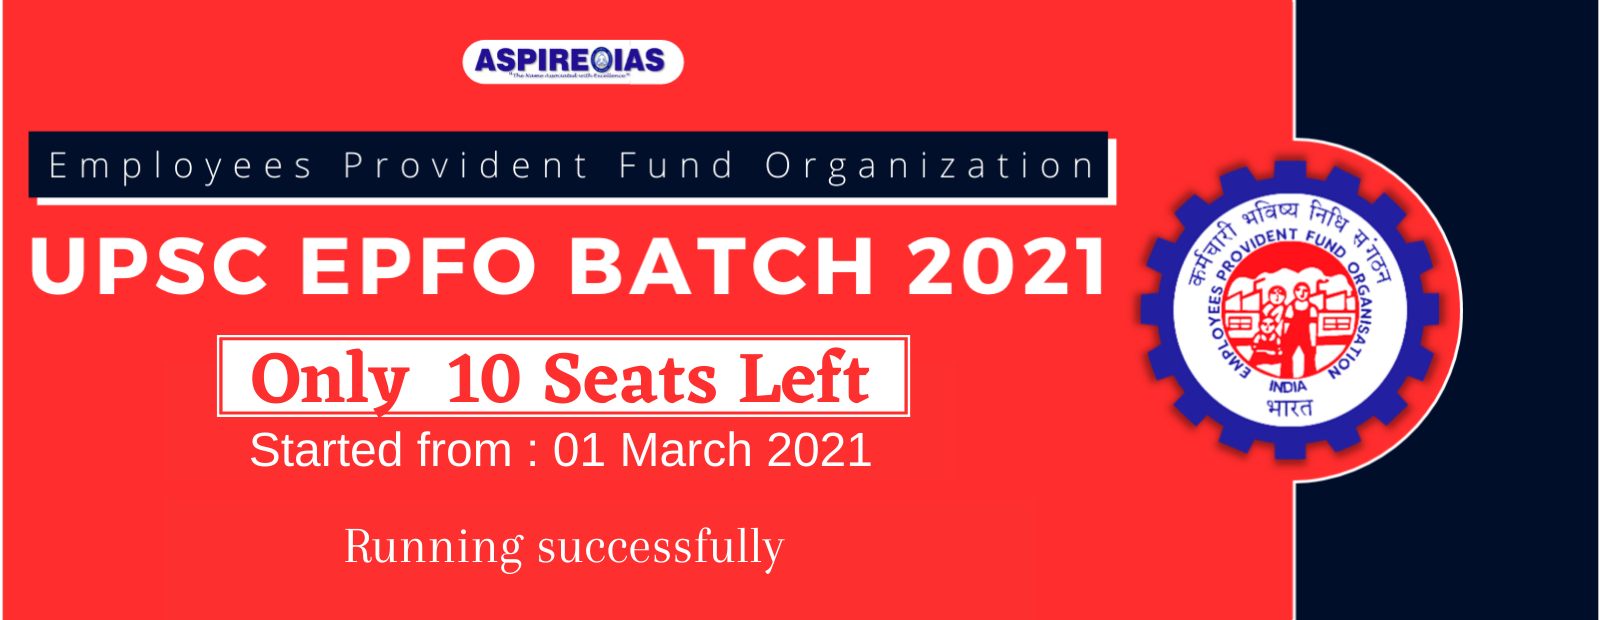 upsc epfo batch 2021